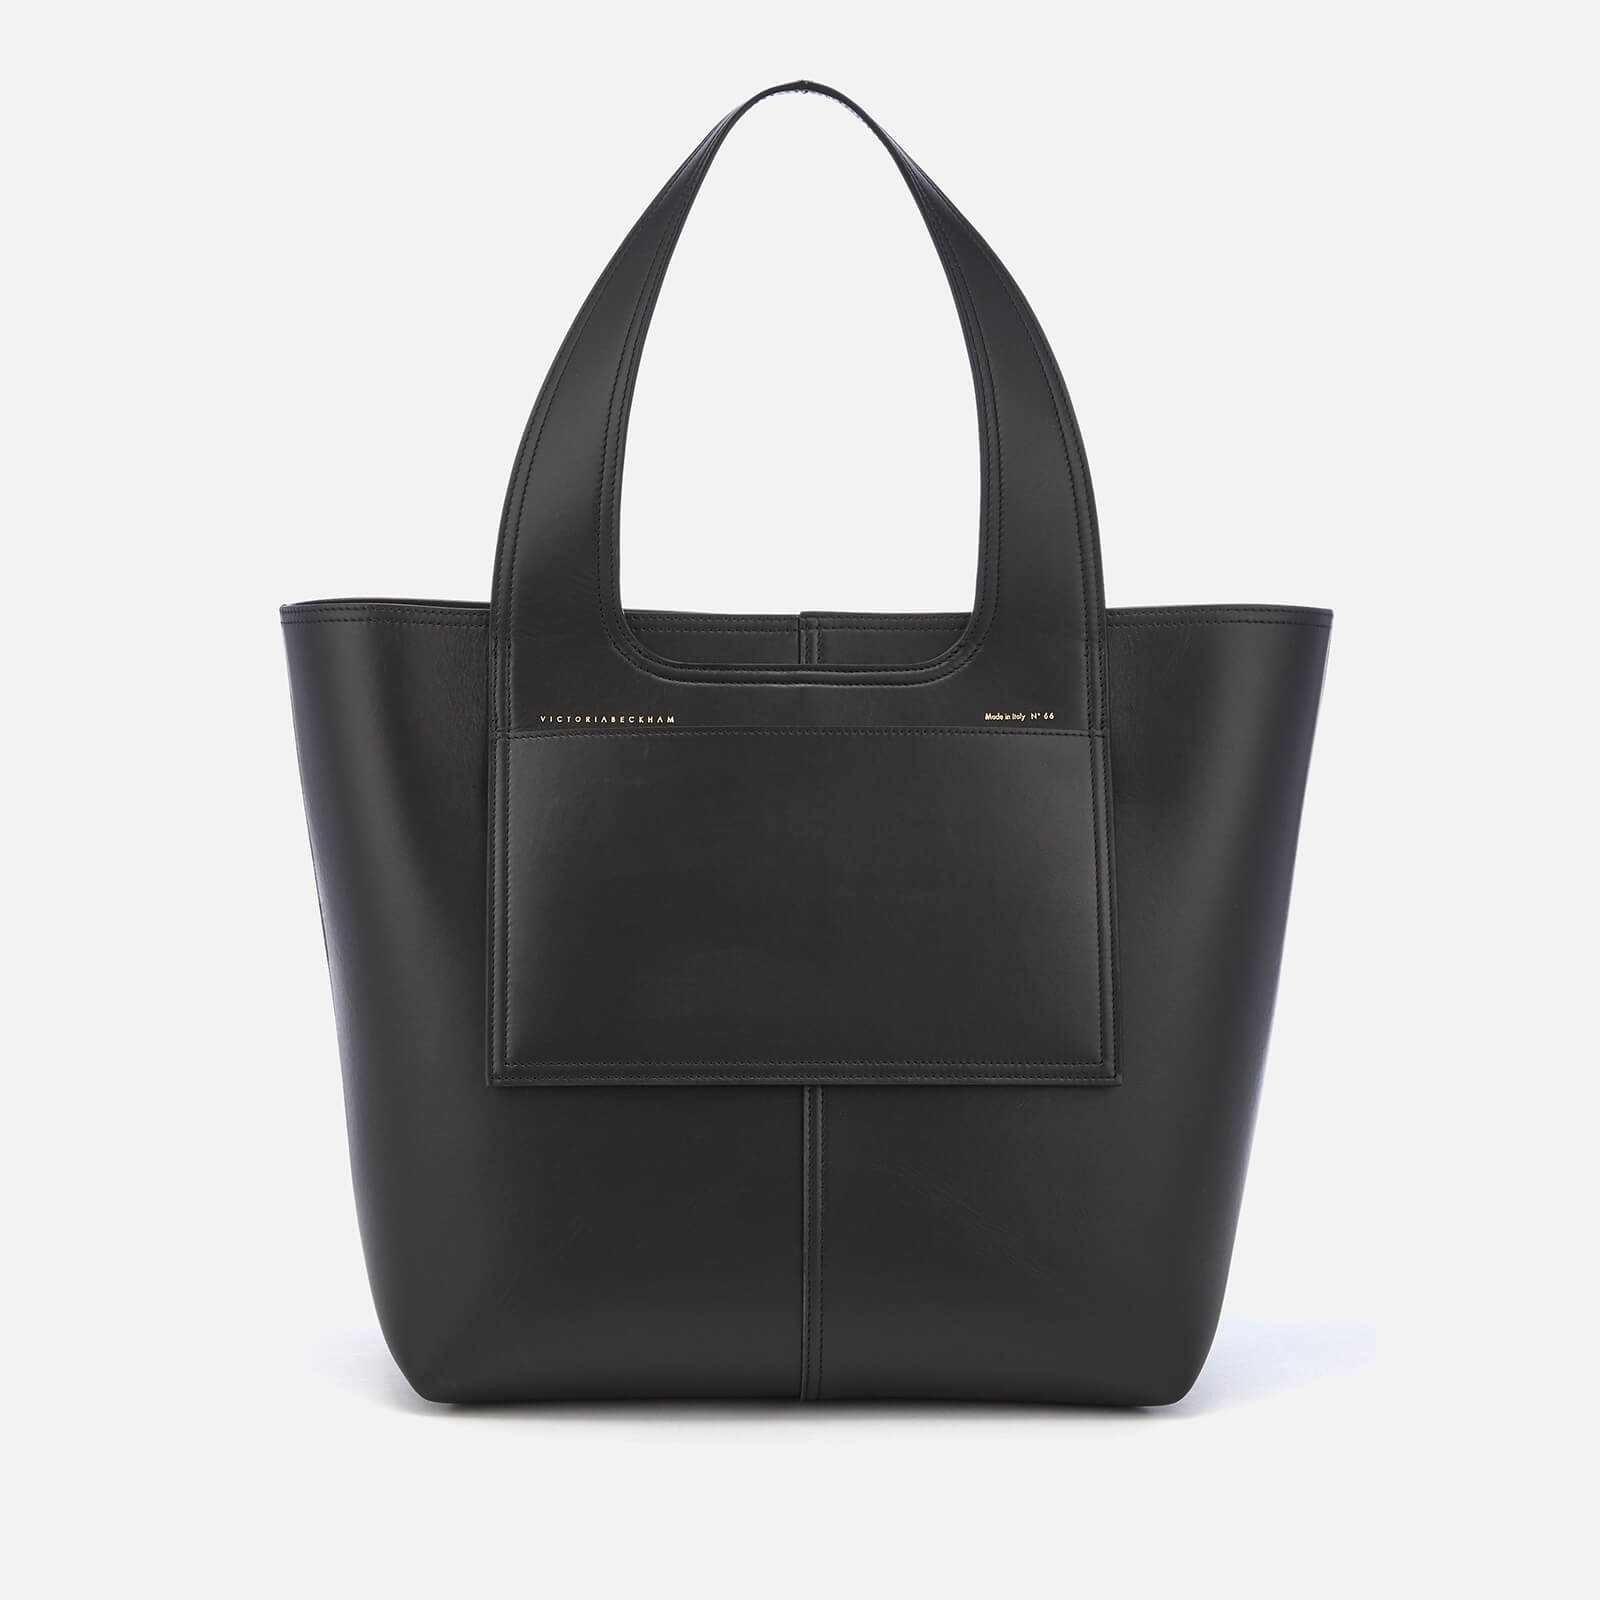 3572456b6b Victoria Beckham Women s Apron Tote Bag - Black - Free UK Delivery ...